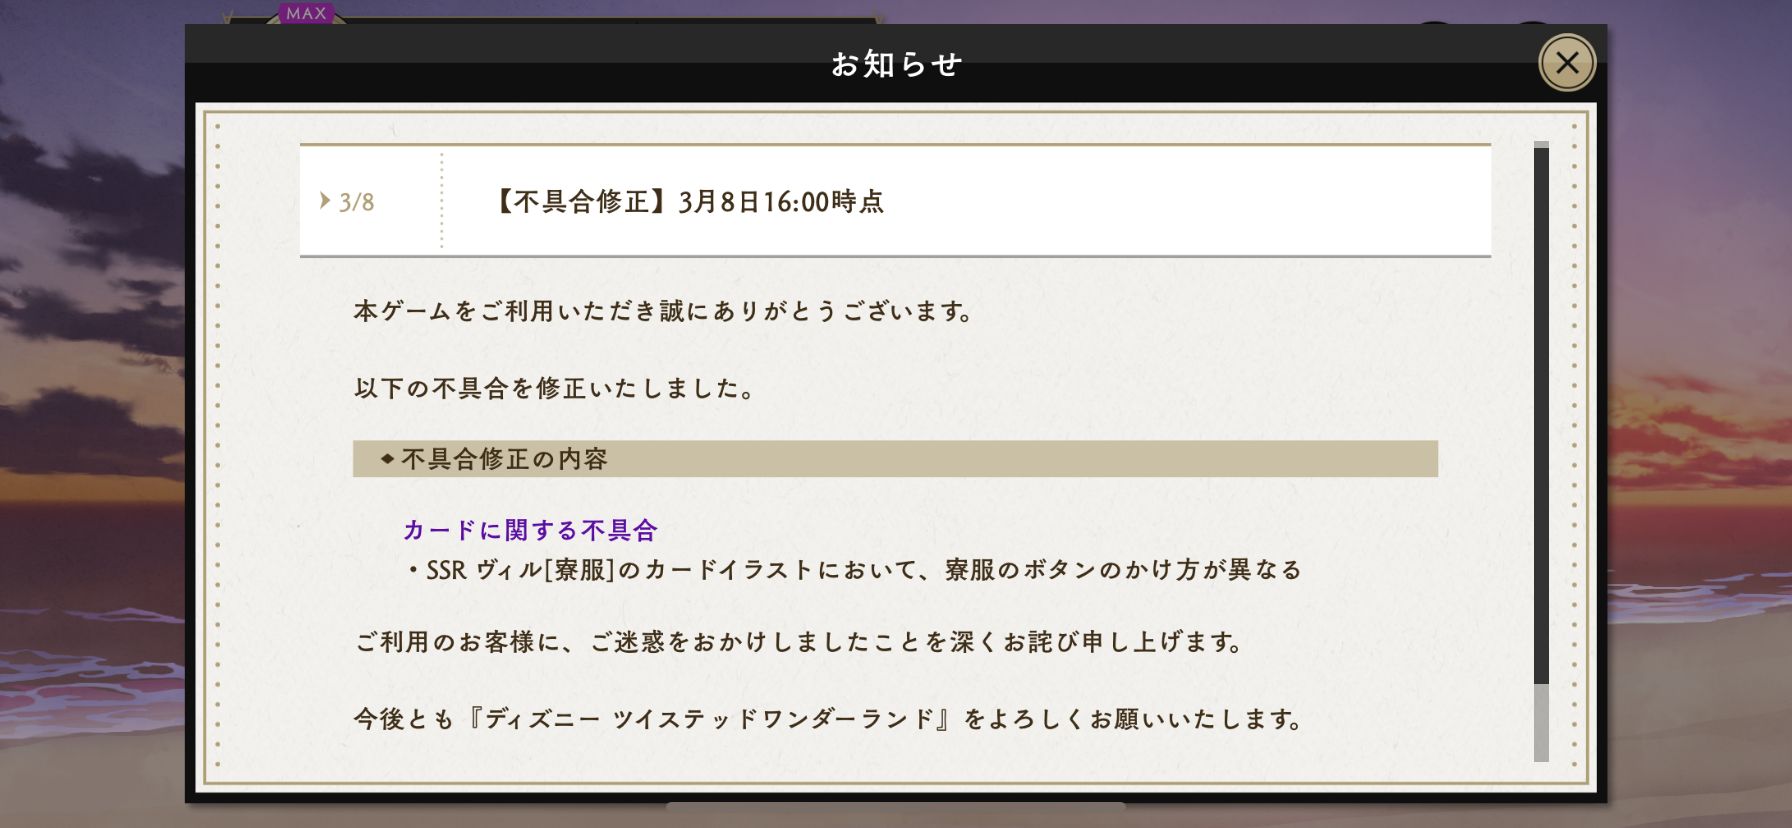 f:id:motimoti444:20210316034412p:plain